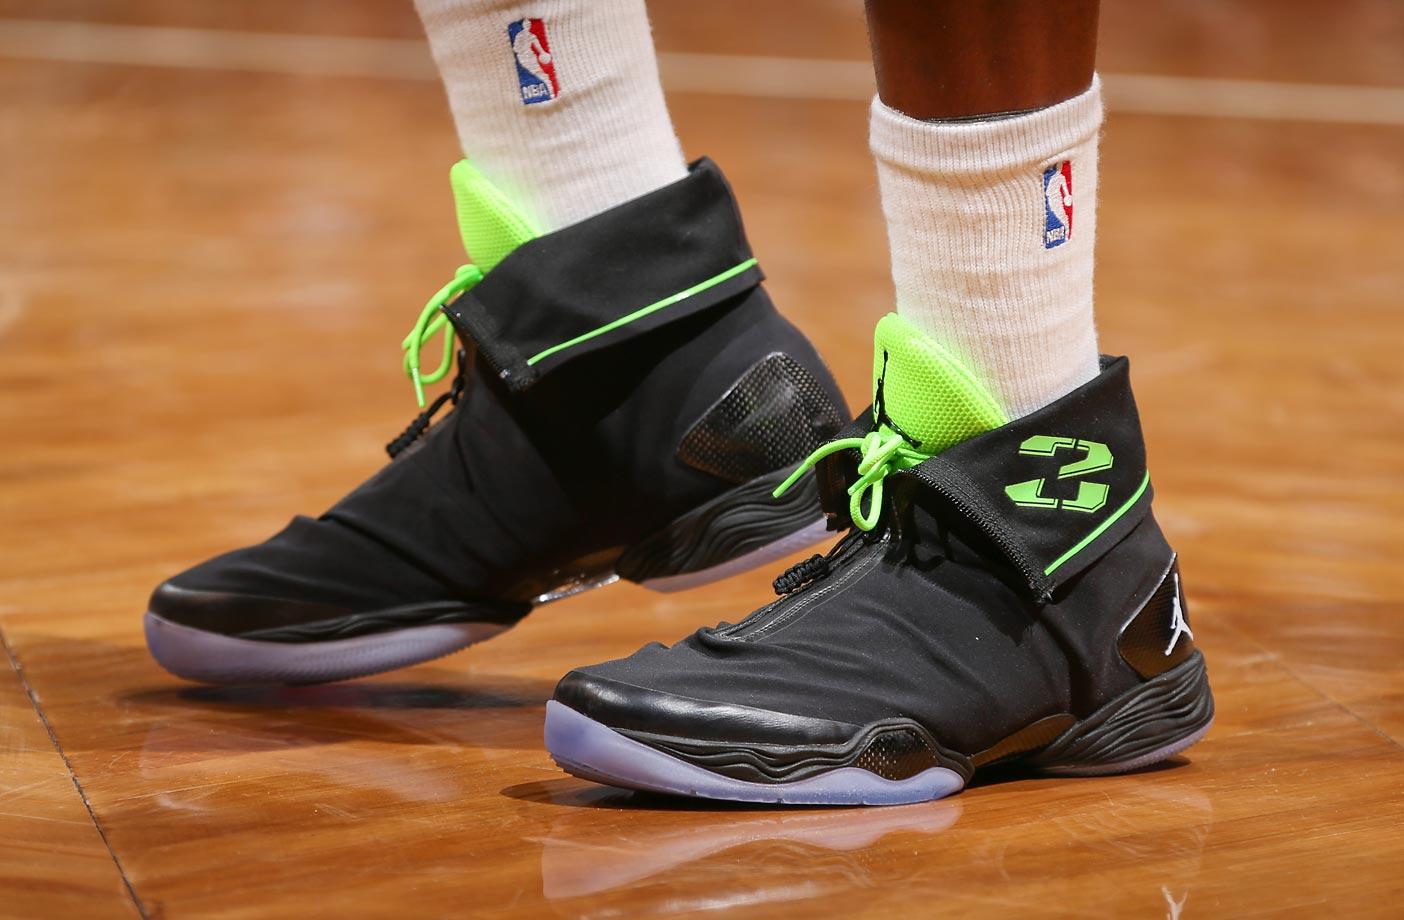 d43826be9710 A detail of the Nike Air Jordan XX8 sneakers worn by Joe Johnson of the  Brooklyn